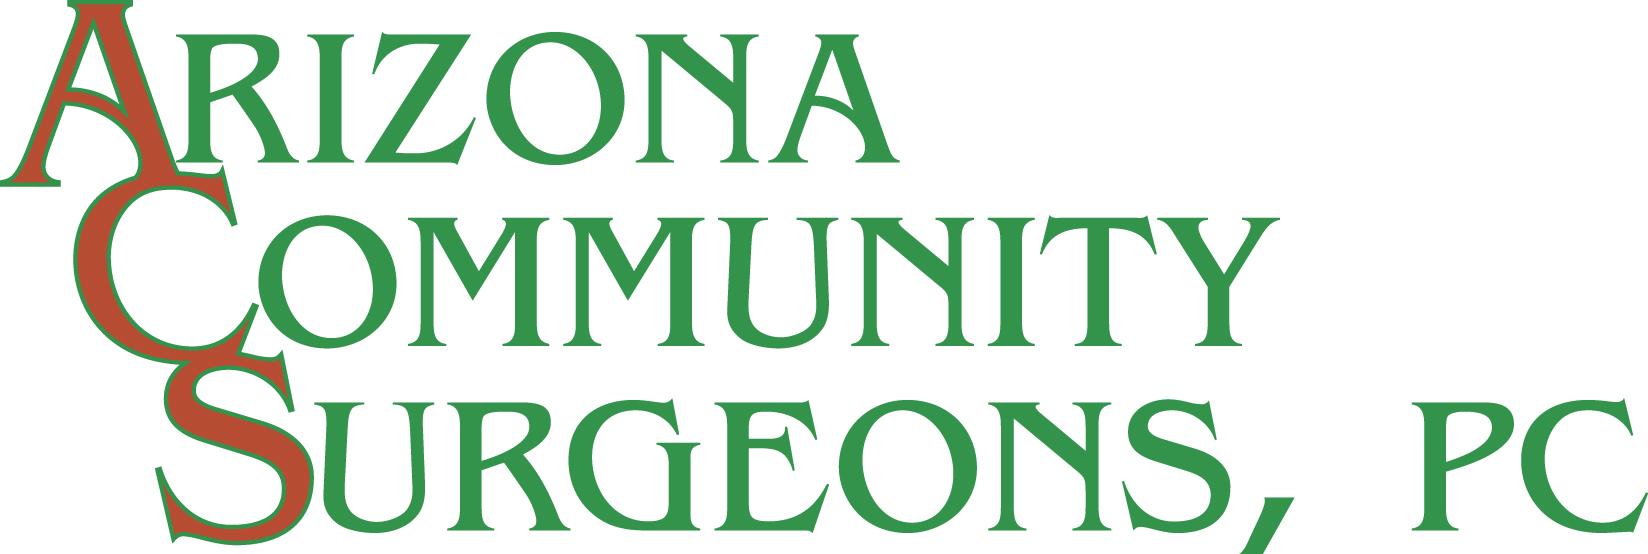 Arizona Community Surgeons